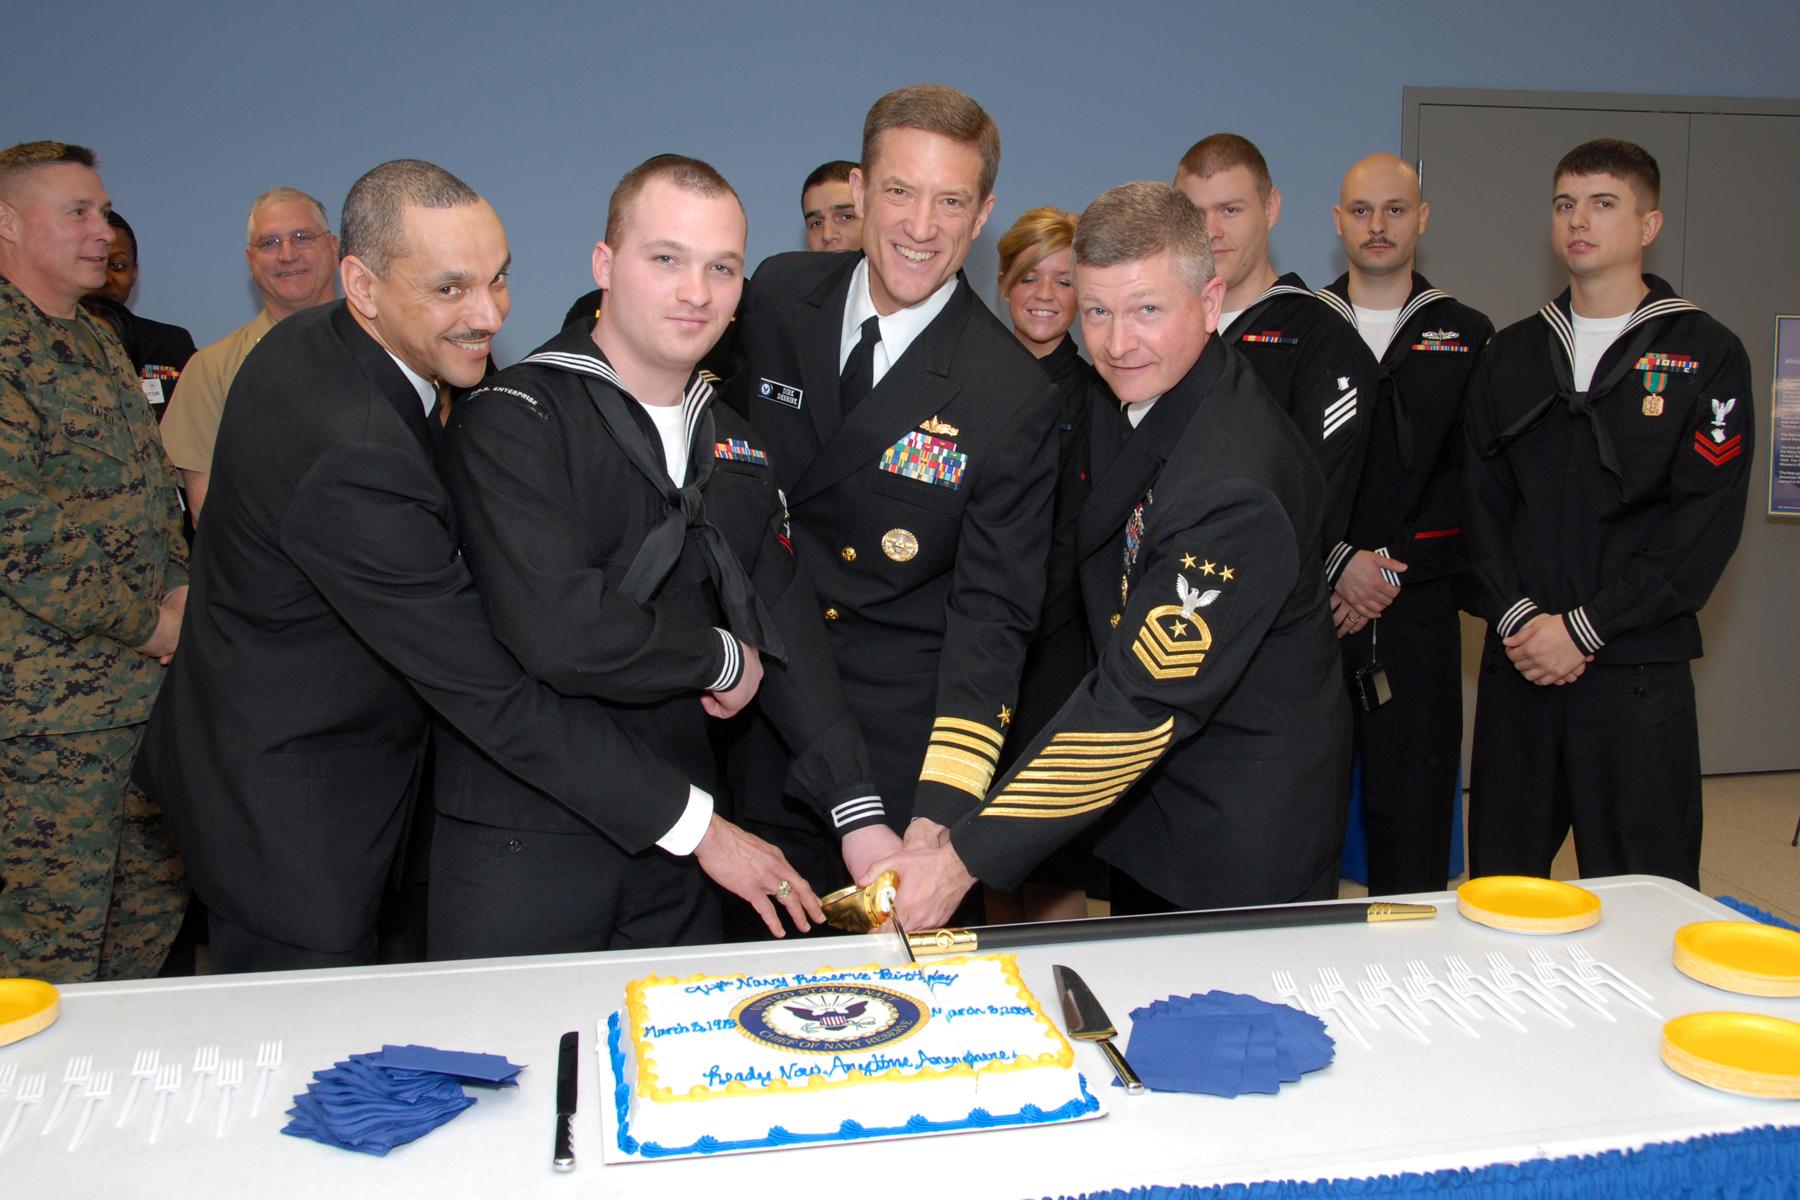 Navy Birthday Cake Cutting Ceremony Veterans Day  Logan Hickman